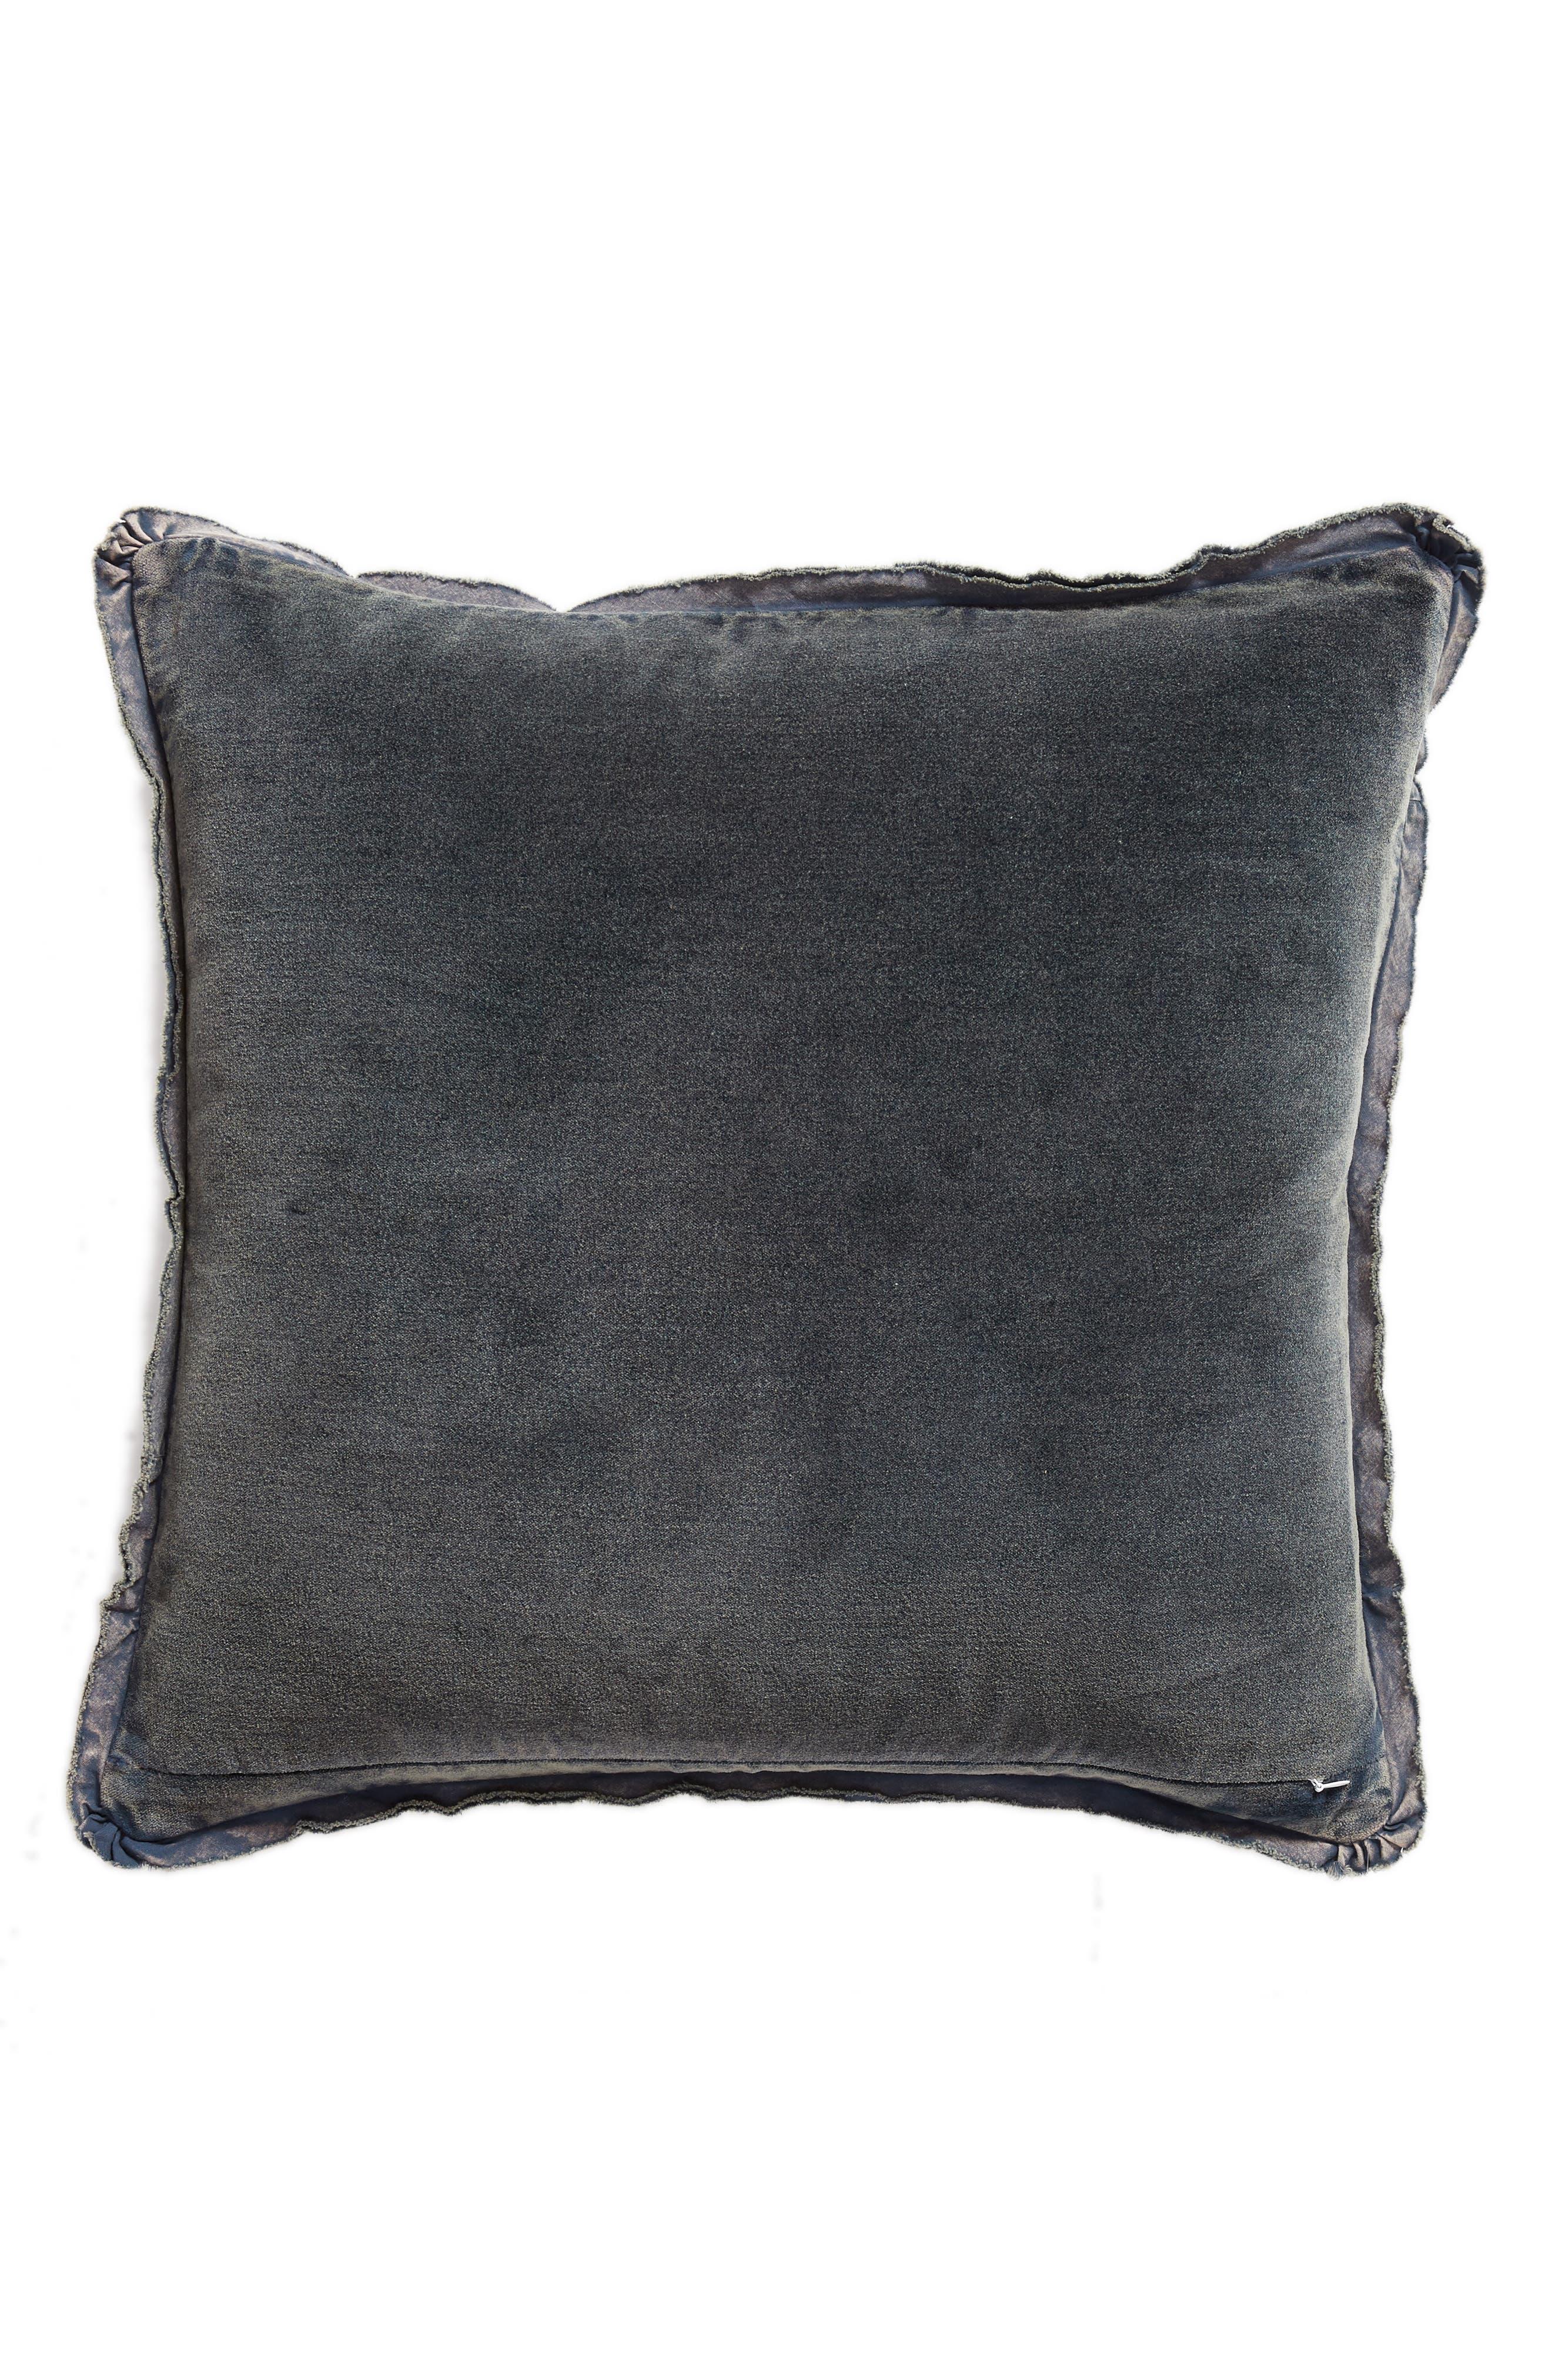 Stonewash Velvet Accent Pillow,                             Alternate thumbnail 2, color,                             NAVY BLUE